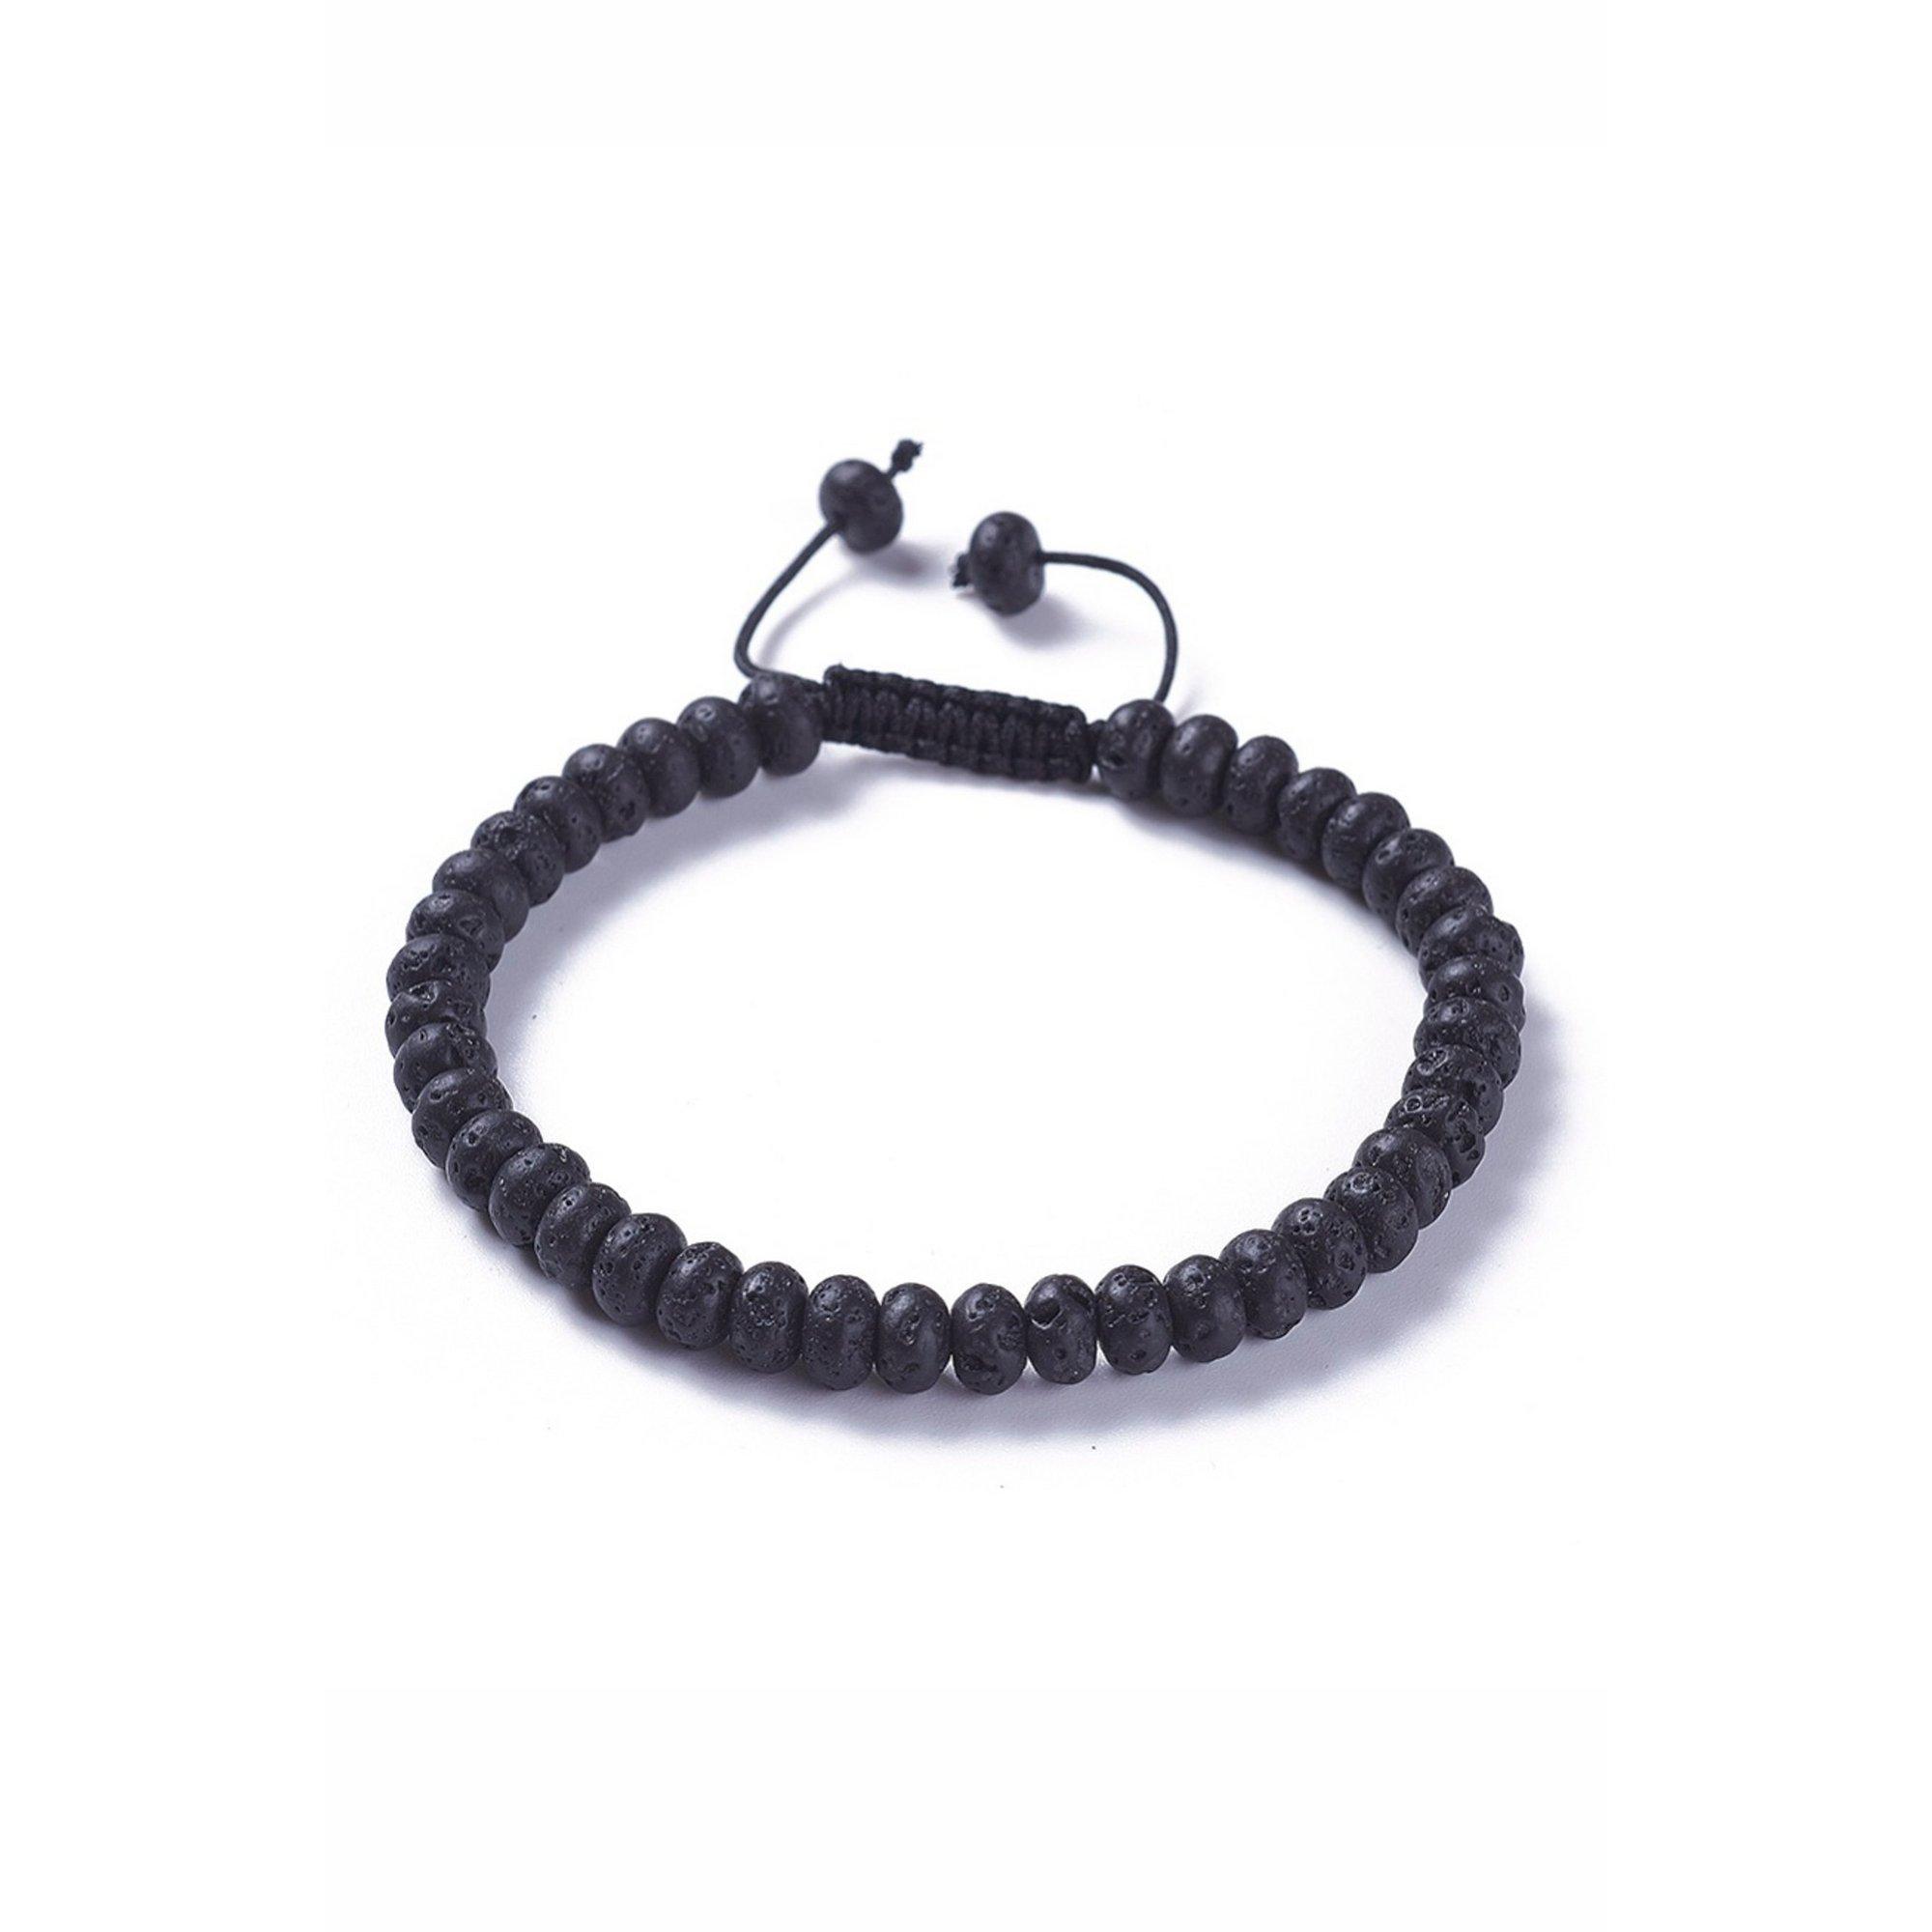 Image of Black Lava Bead Bracelet